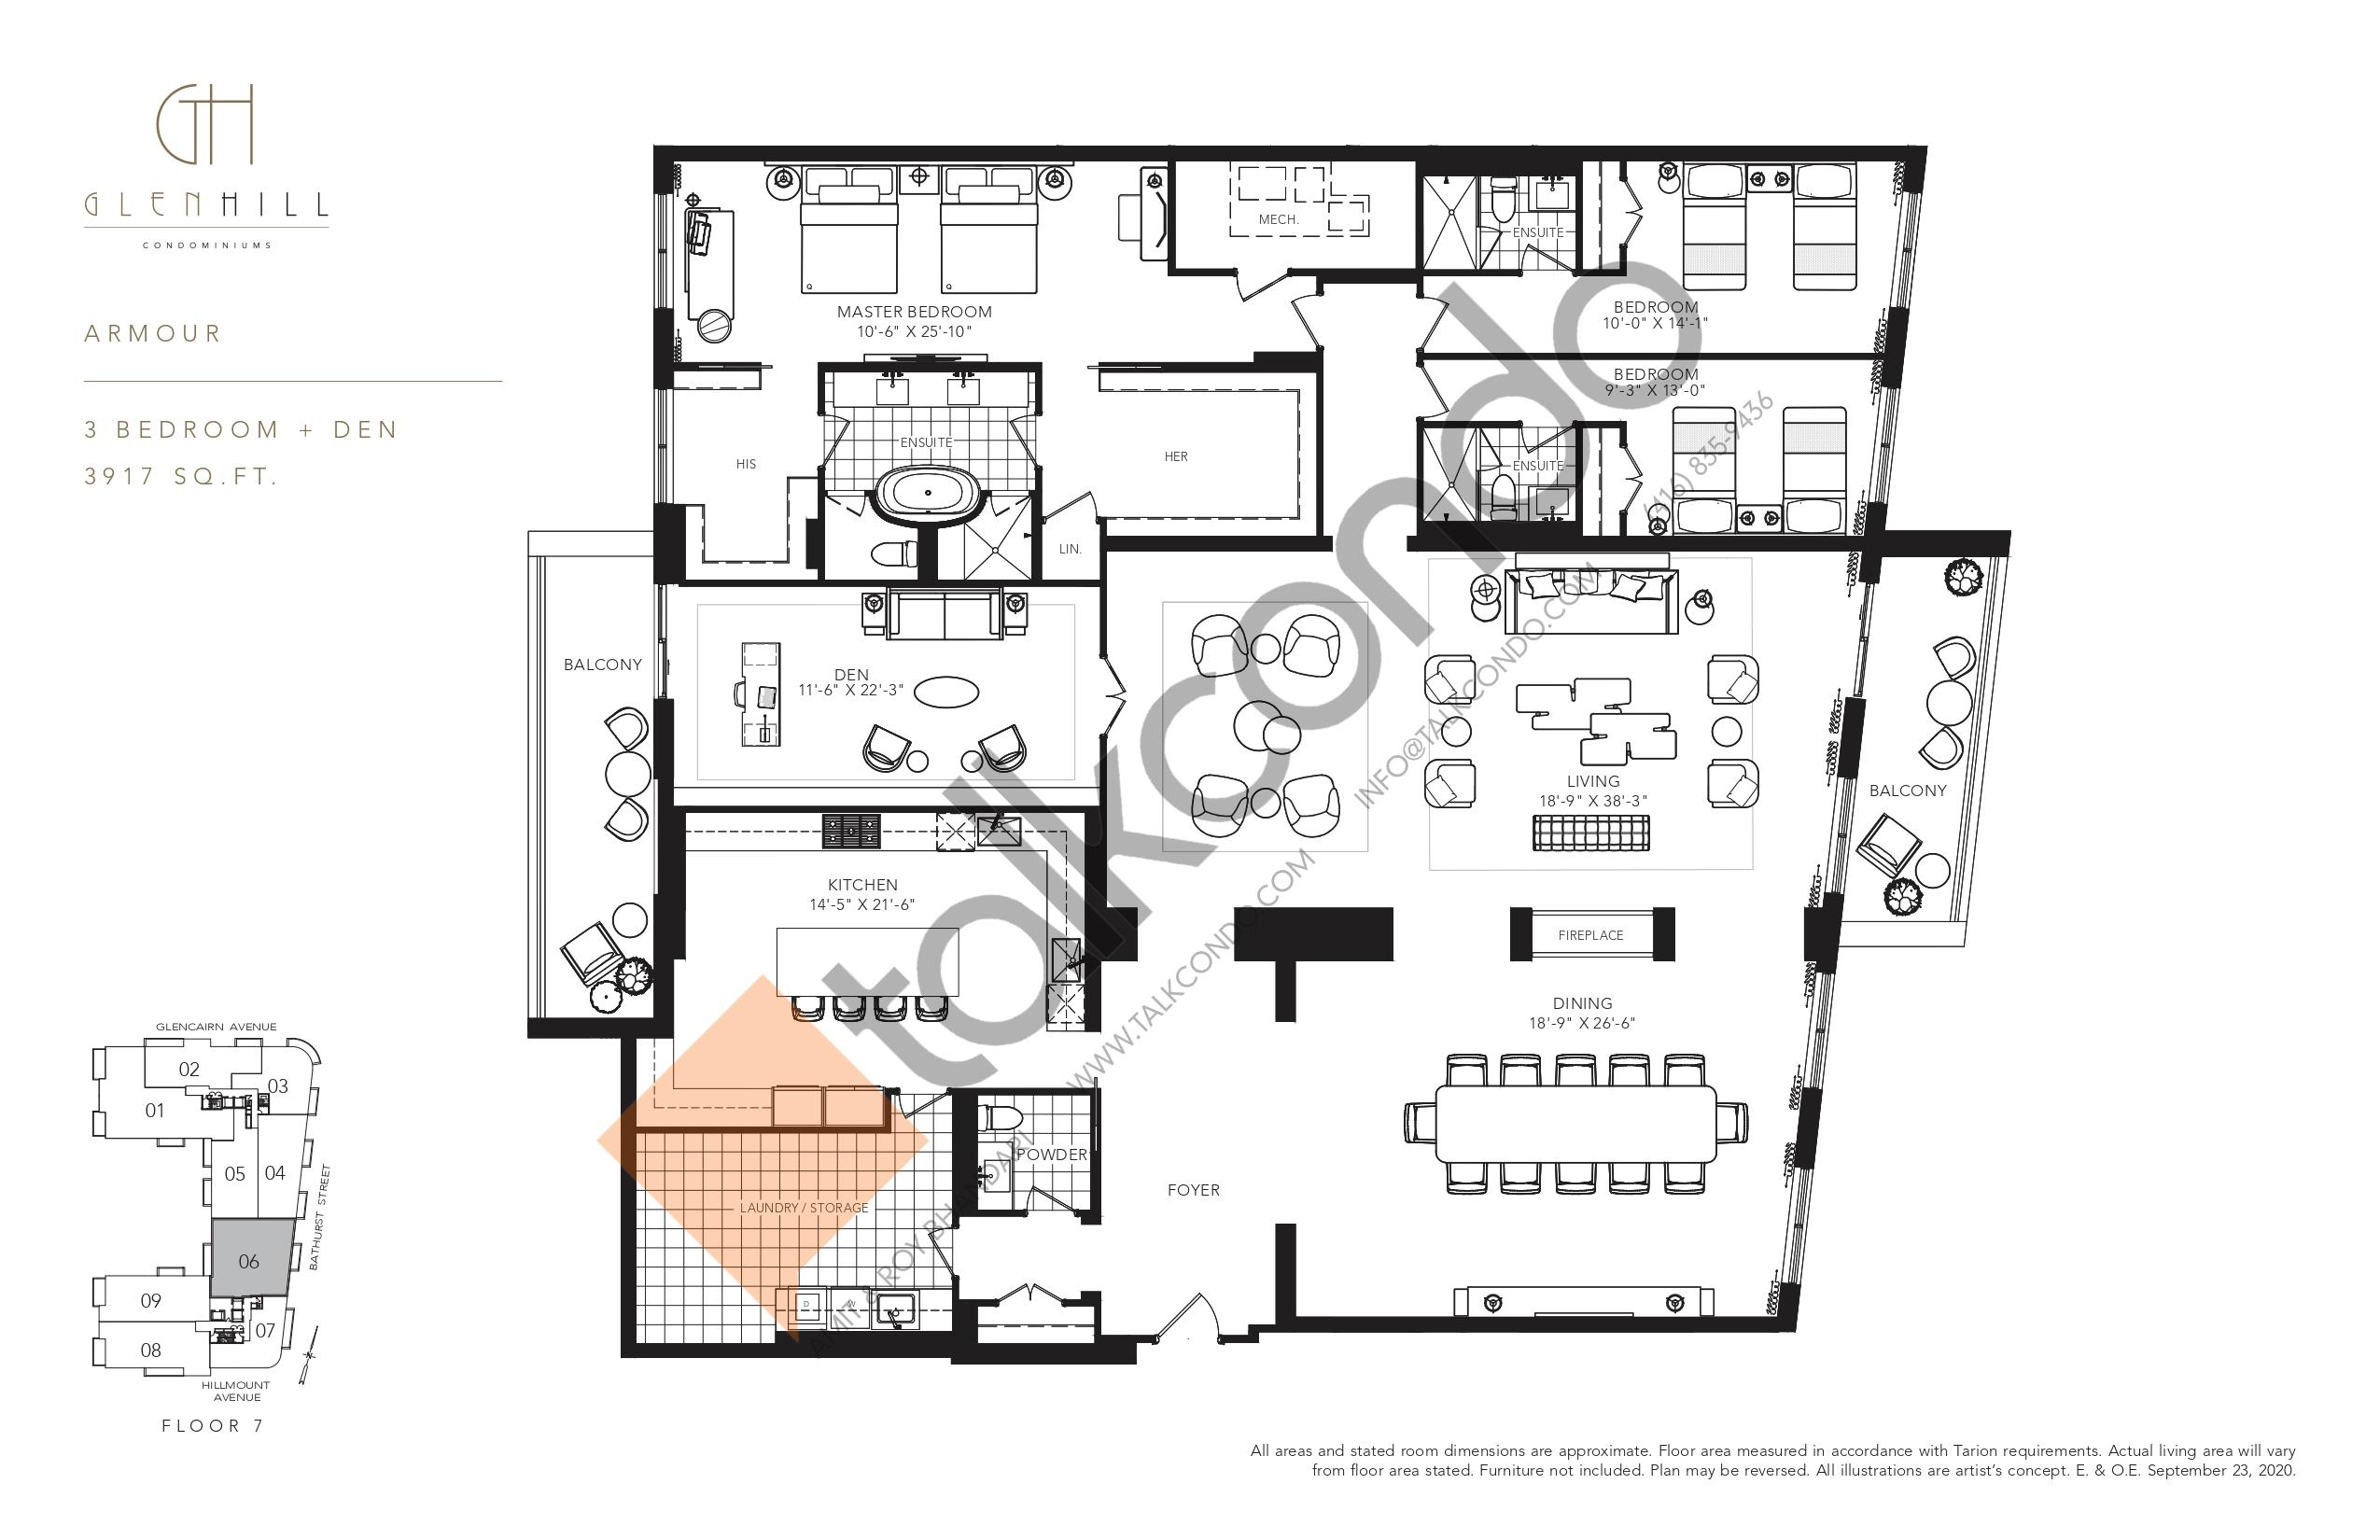 Armour Floor Plan at Glen Hill Condos - 3917 sq.ft